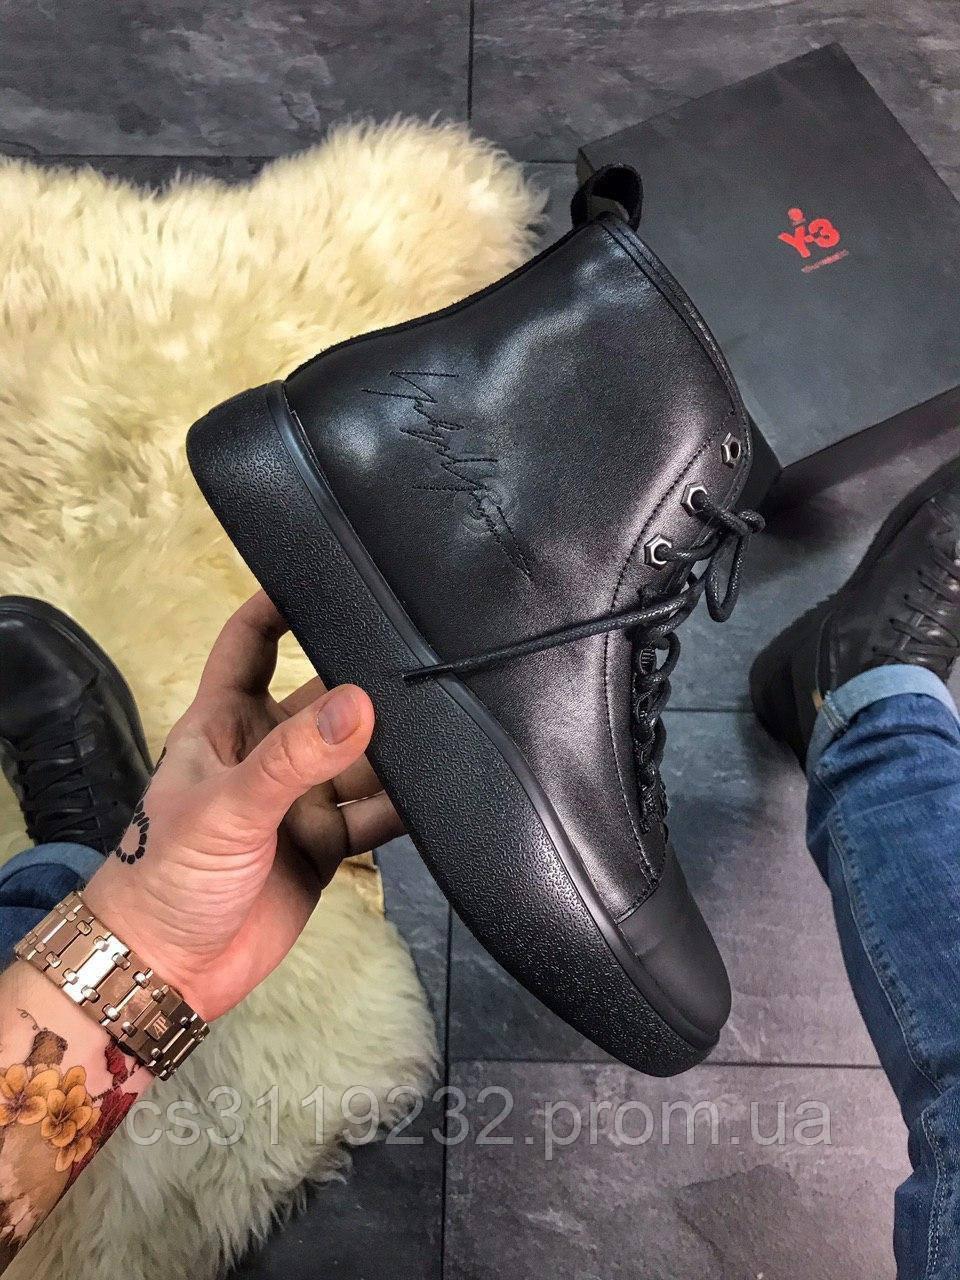 Мужские ботинки демисезонные   Yohji Yamamoto Y-3 Bashyo Full Black(черный)